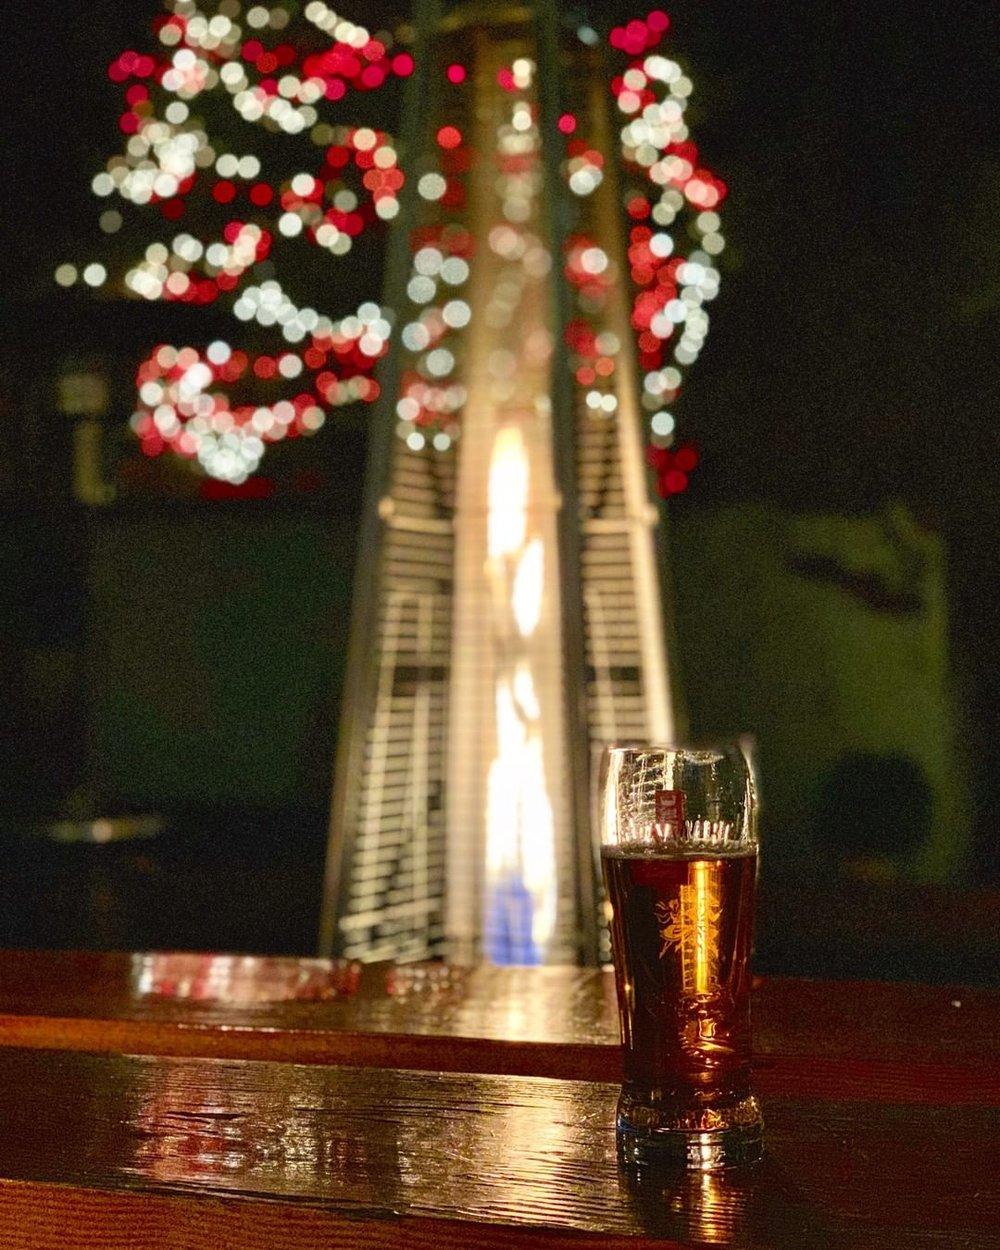 Night - Tree - Zywiec - Holiday.jpg